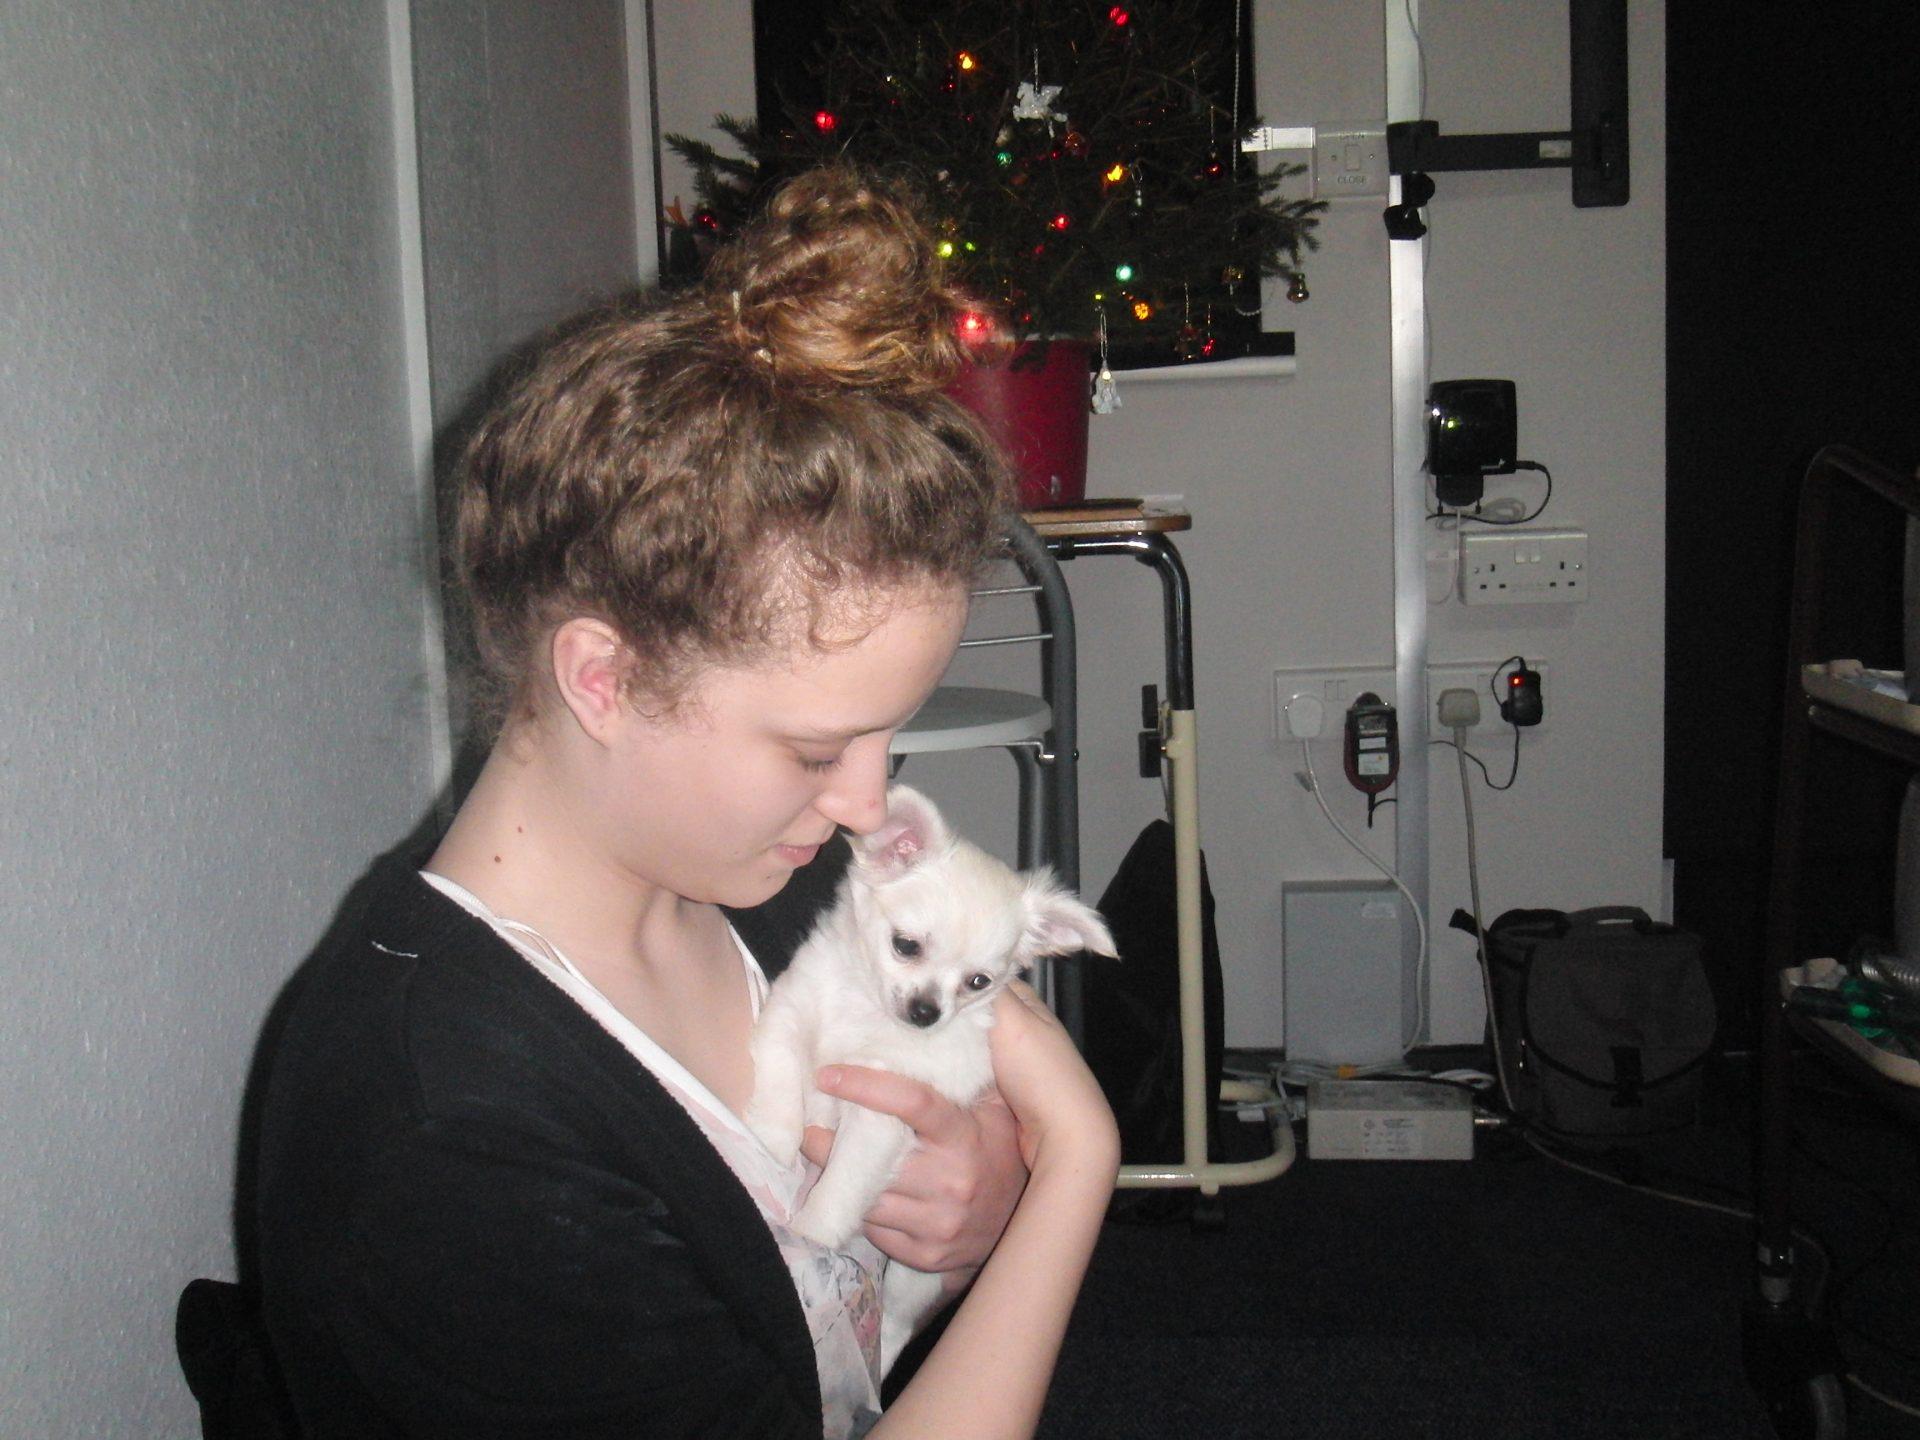 Daniel's Goddaughter holdin a white Chihuahua puppy